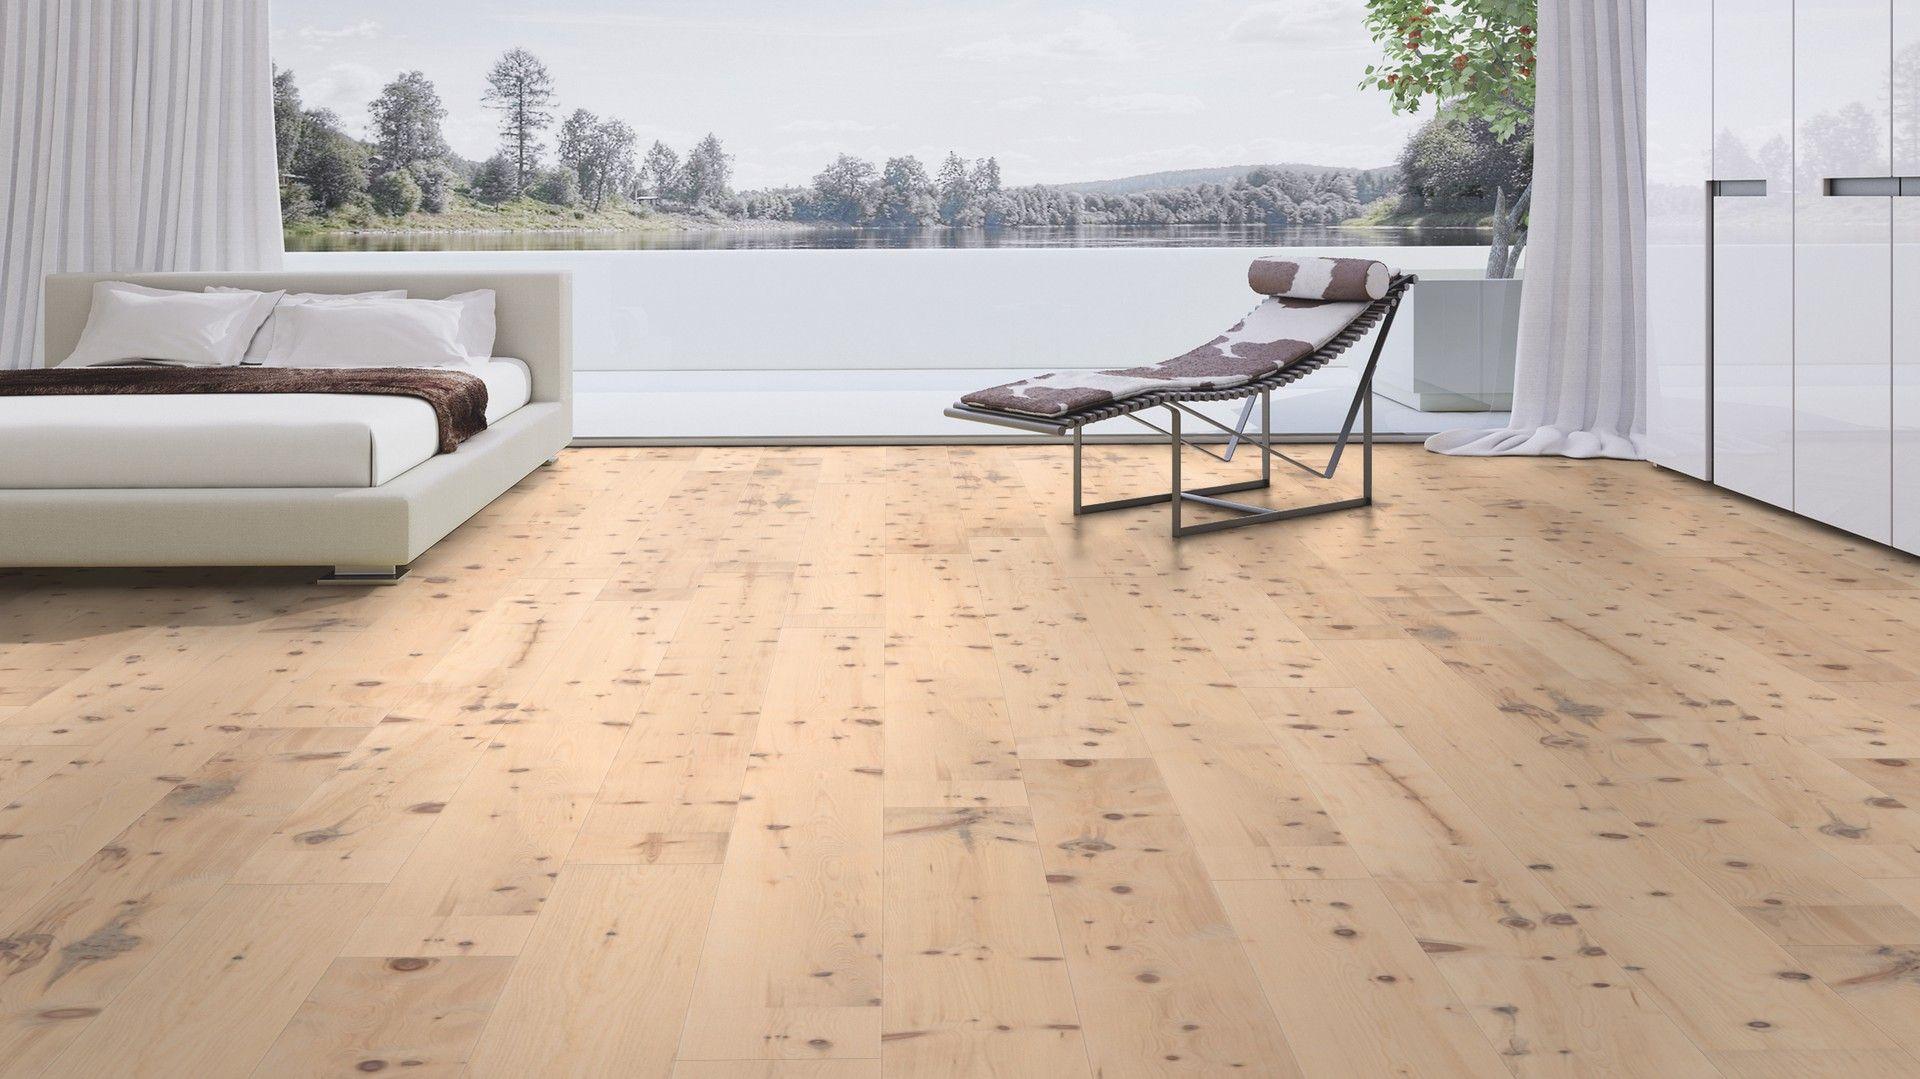 zirben massivdielen naturbauhaus mengler iserlohn gesund baustoffe holz kork bambus parkett. Black Bedroom Furniture Sets. Home Design Ideas